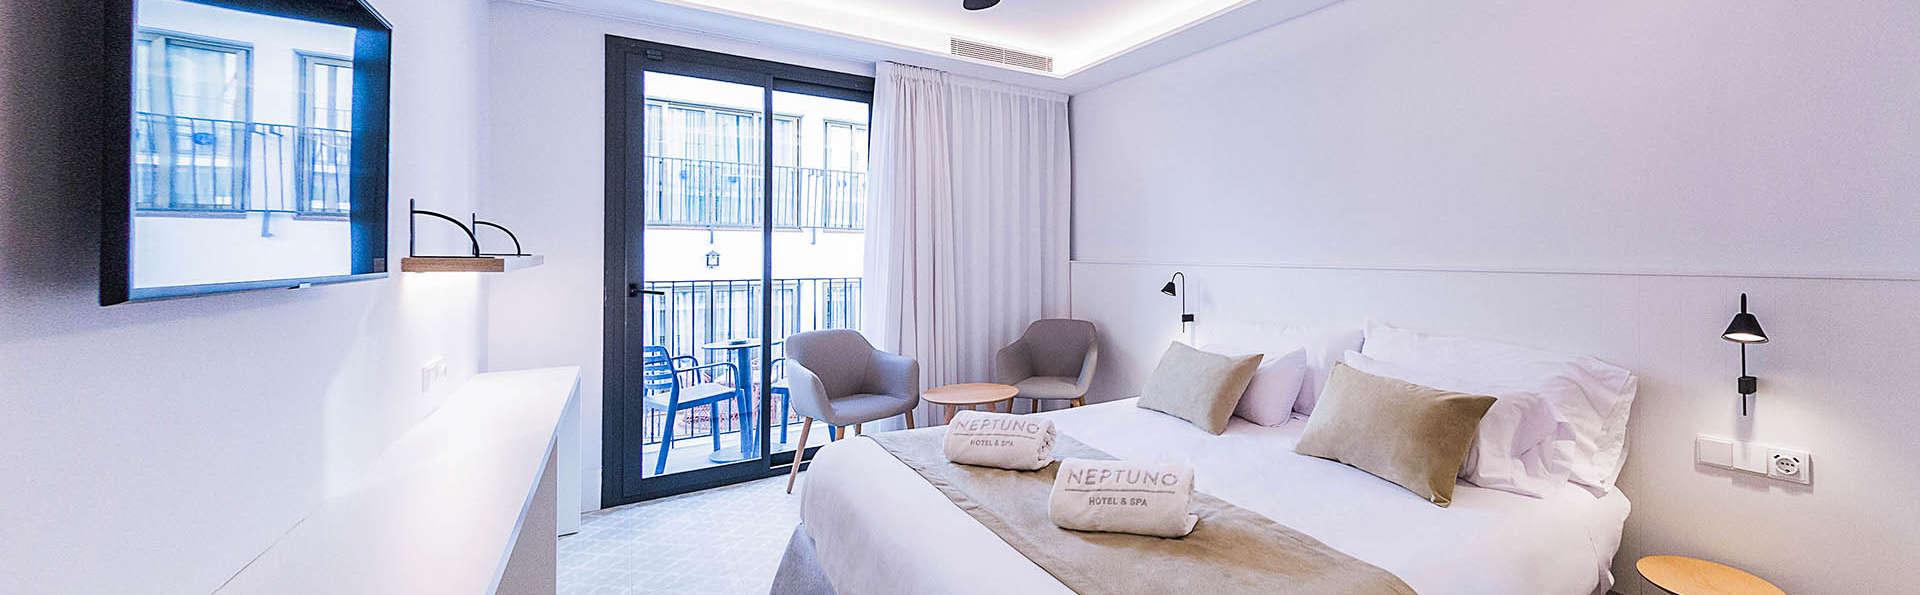 Neptuno Hotel & SPA - EDIT_BEDROOM_04.jpg